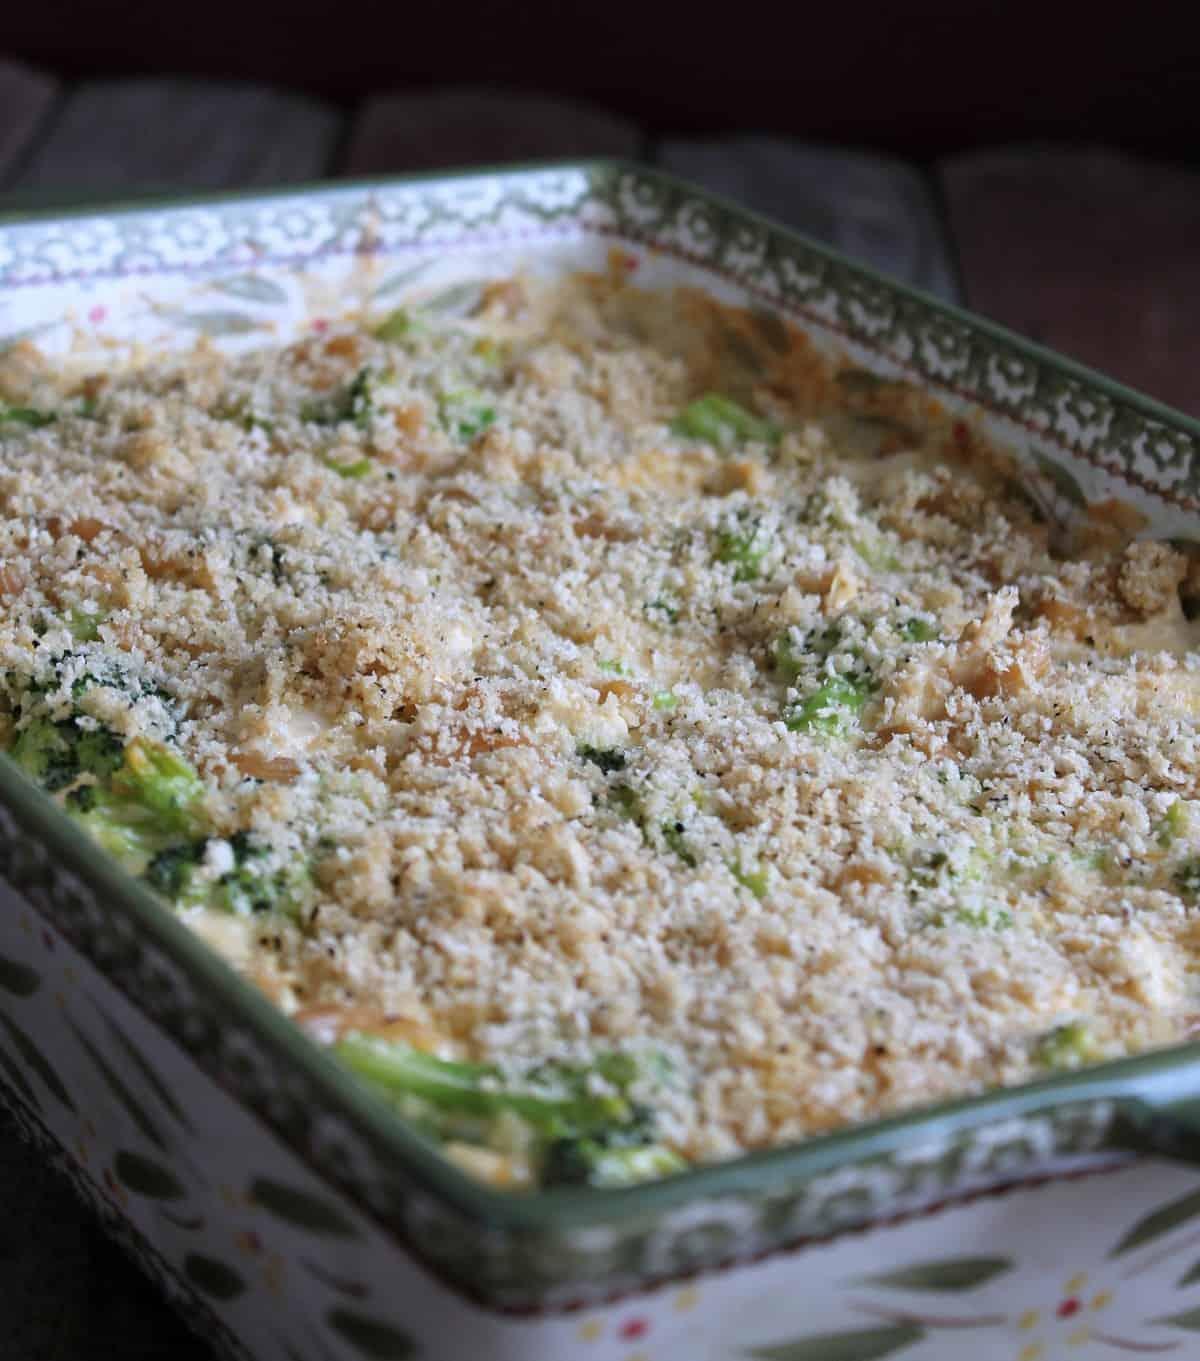 Broccoli, Chicken, And Cheese Pasta Bake - Organize -7047